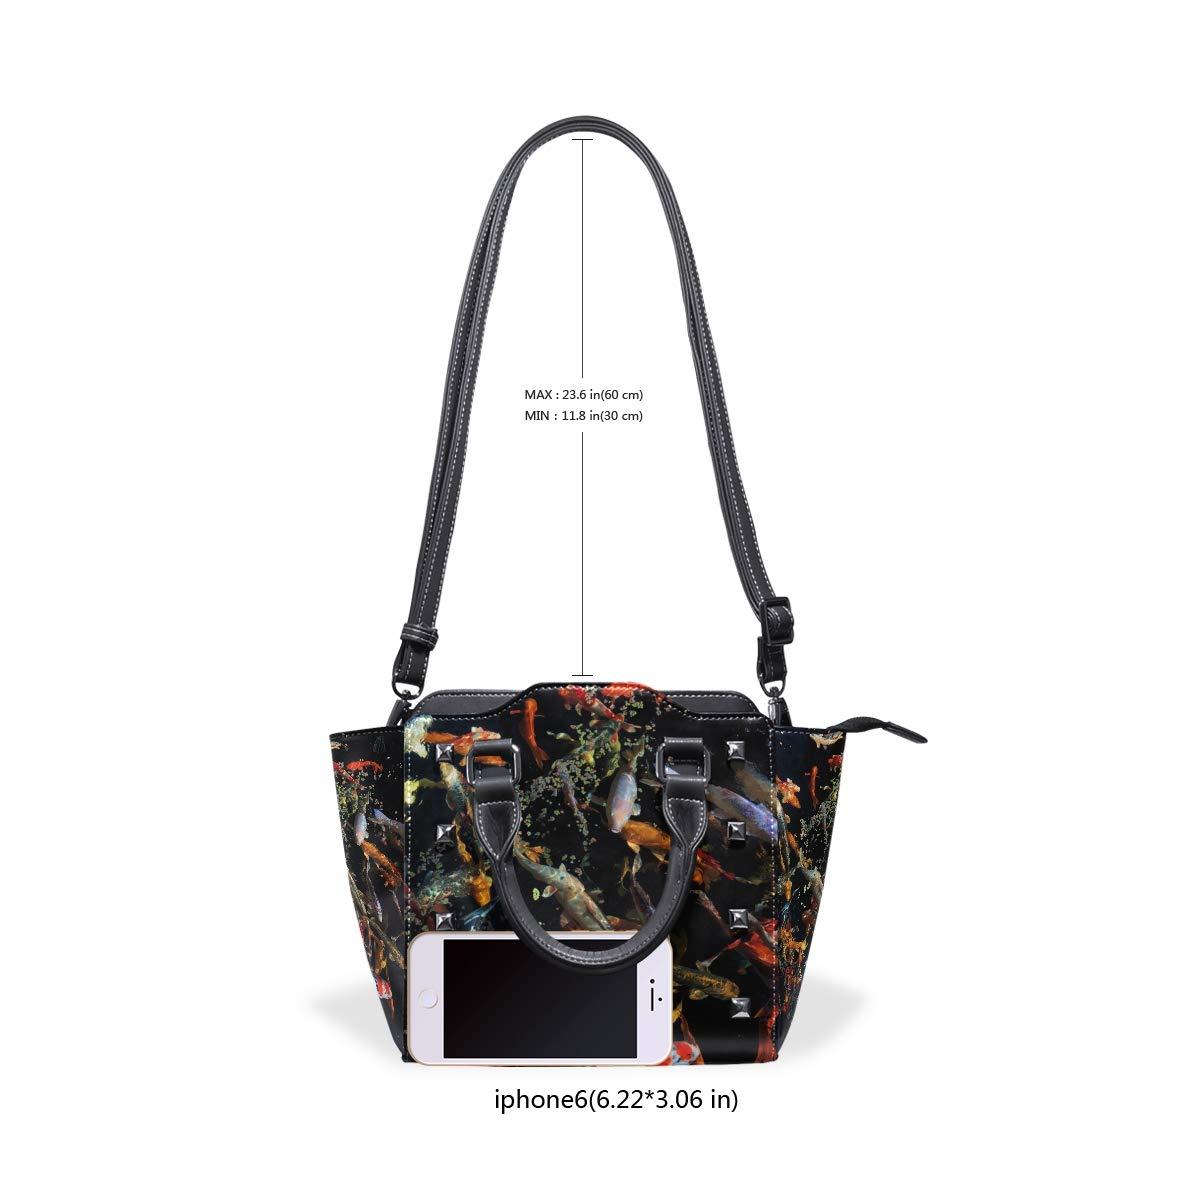 Japanese Koi Fish Genuine Leather Handbags Purses Shoulder Tote Satchel Bags Womens